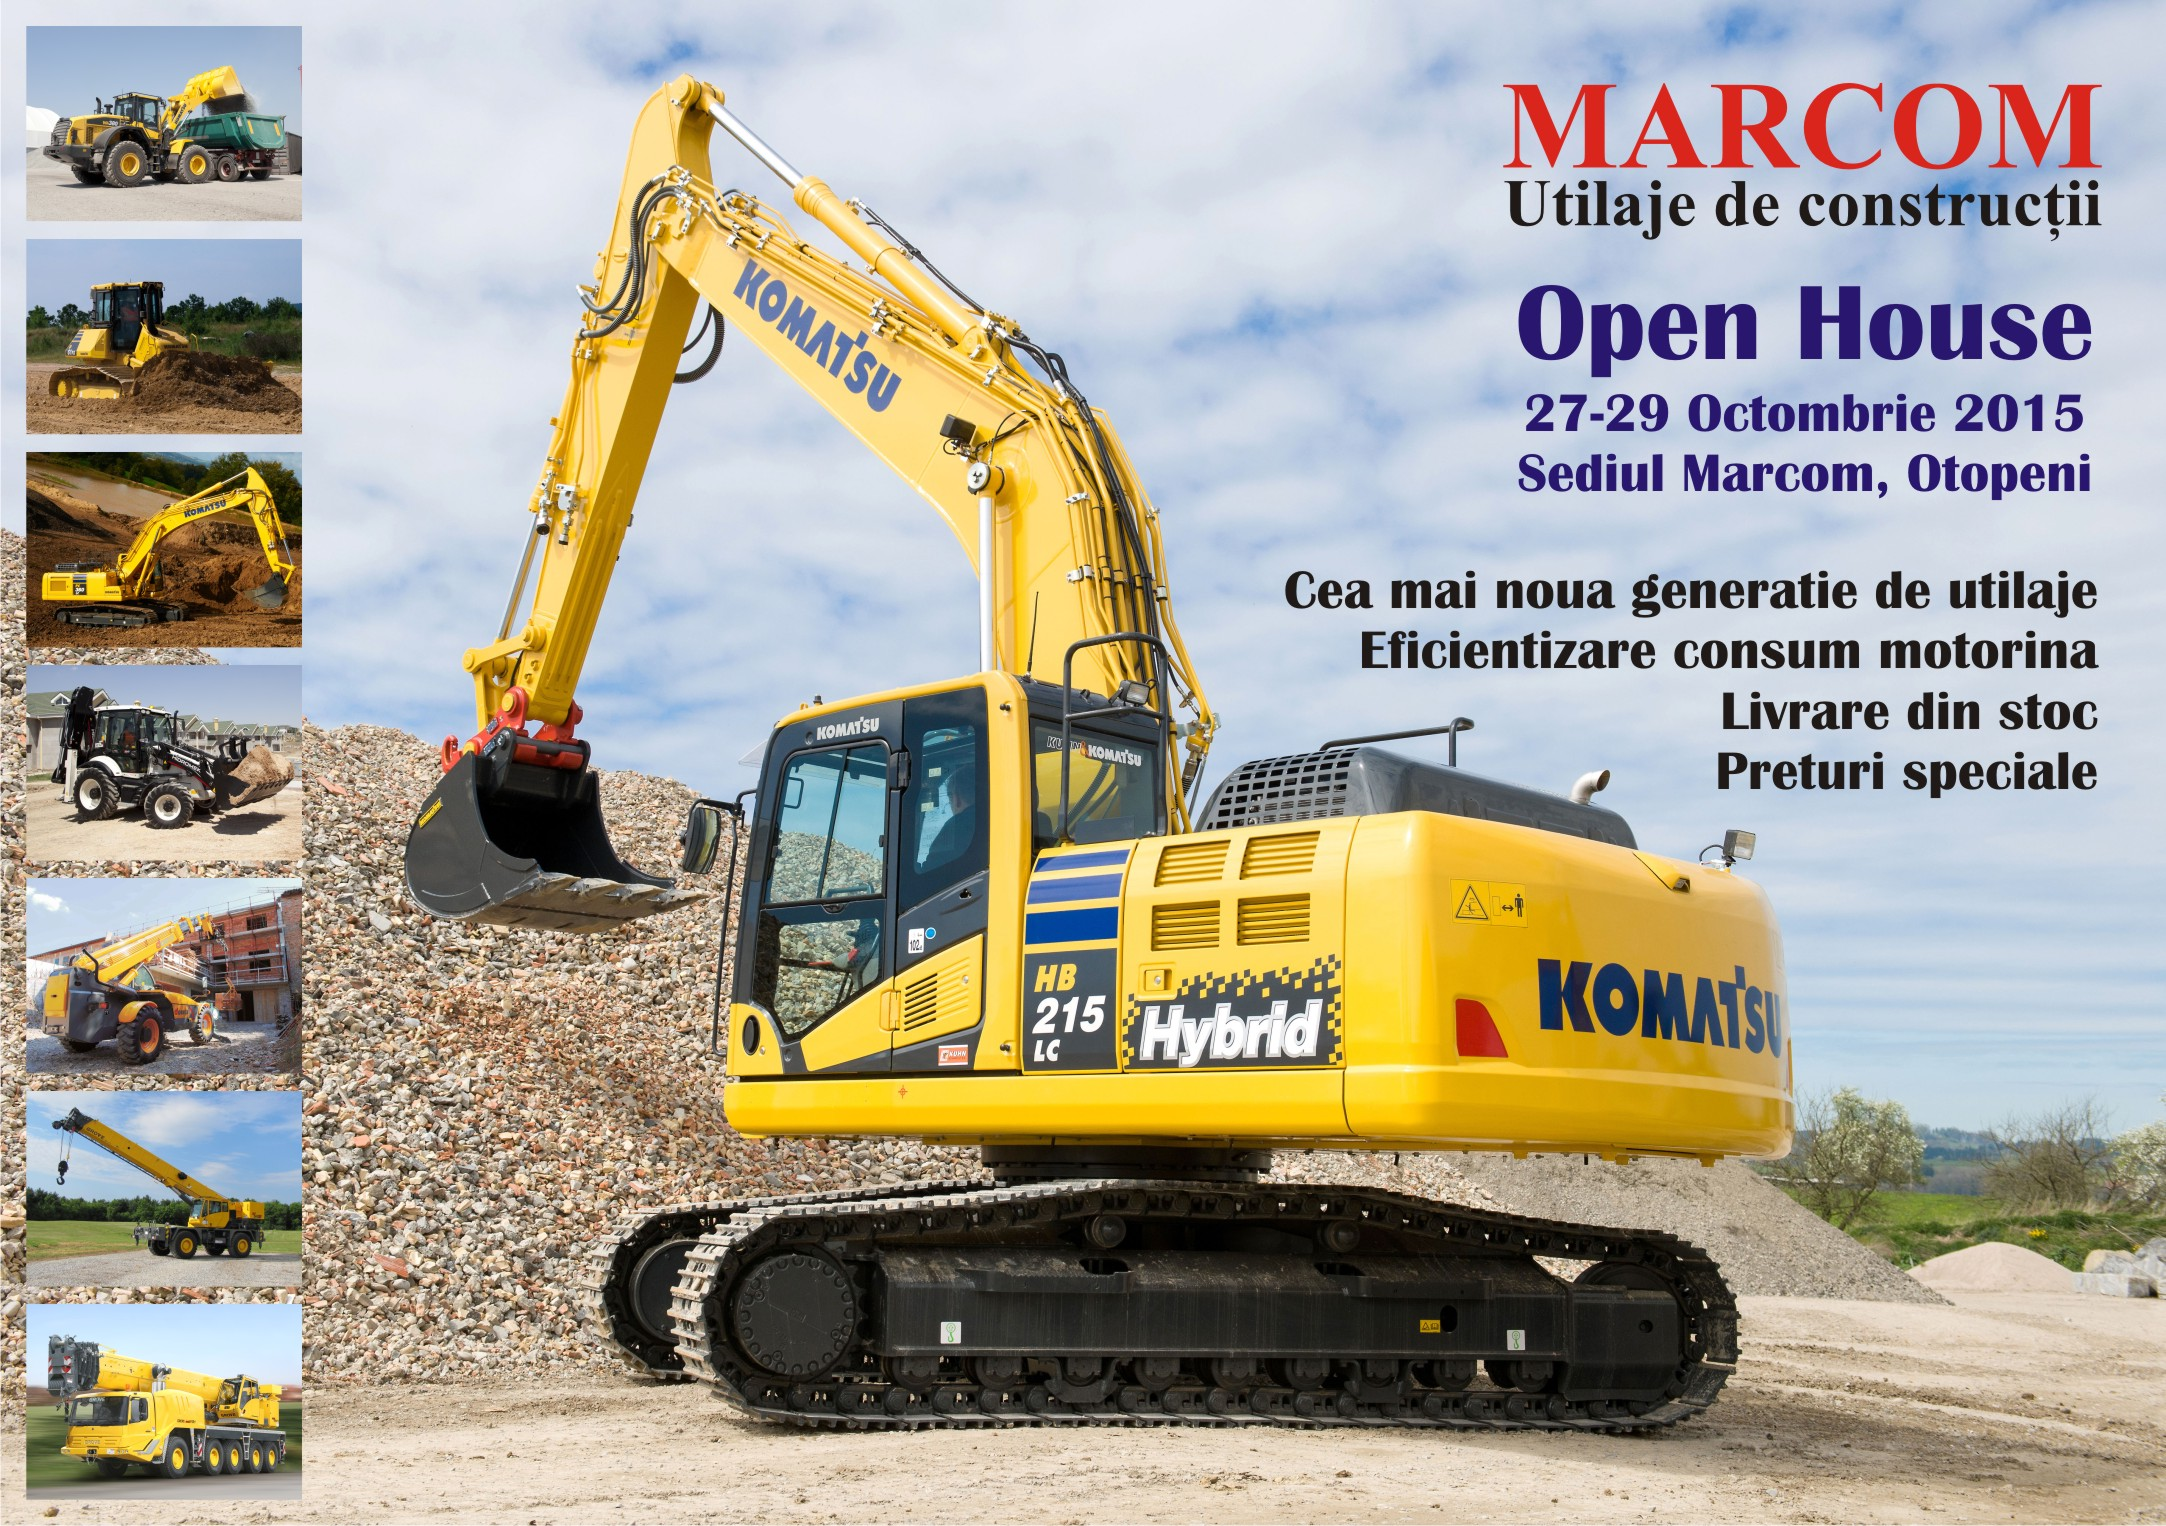 Utilaje&Constructii Marcom Open House